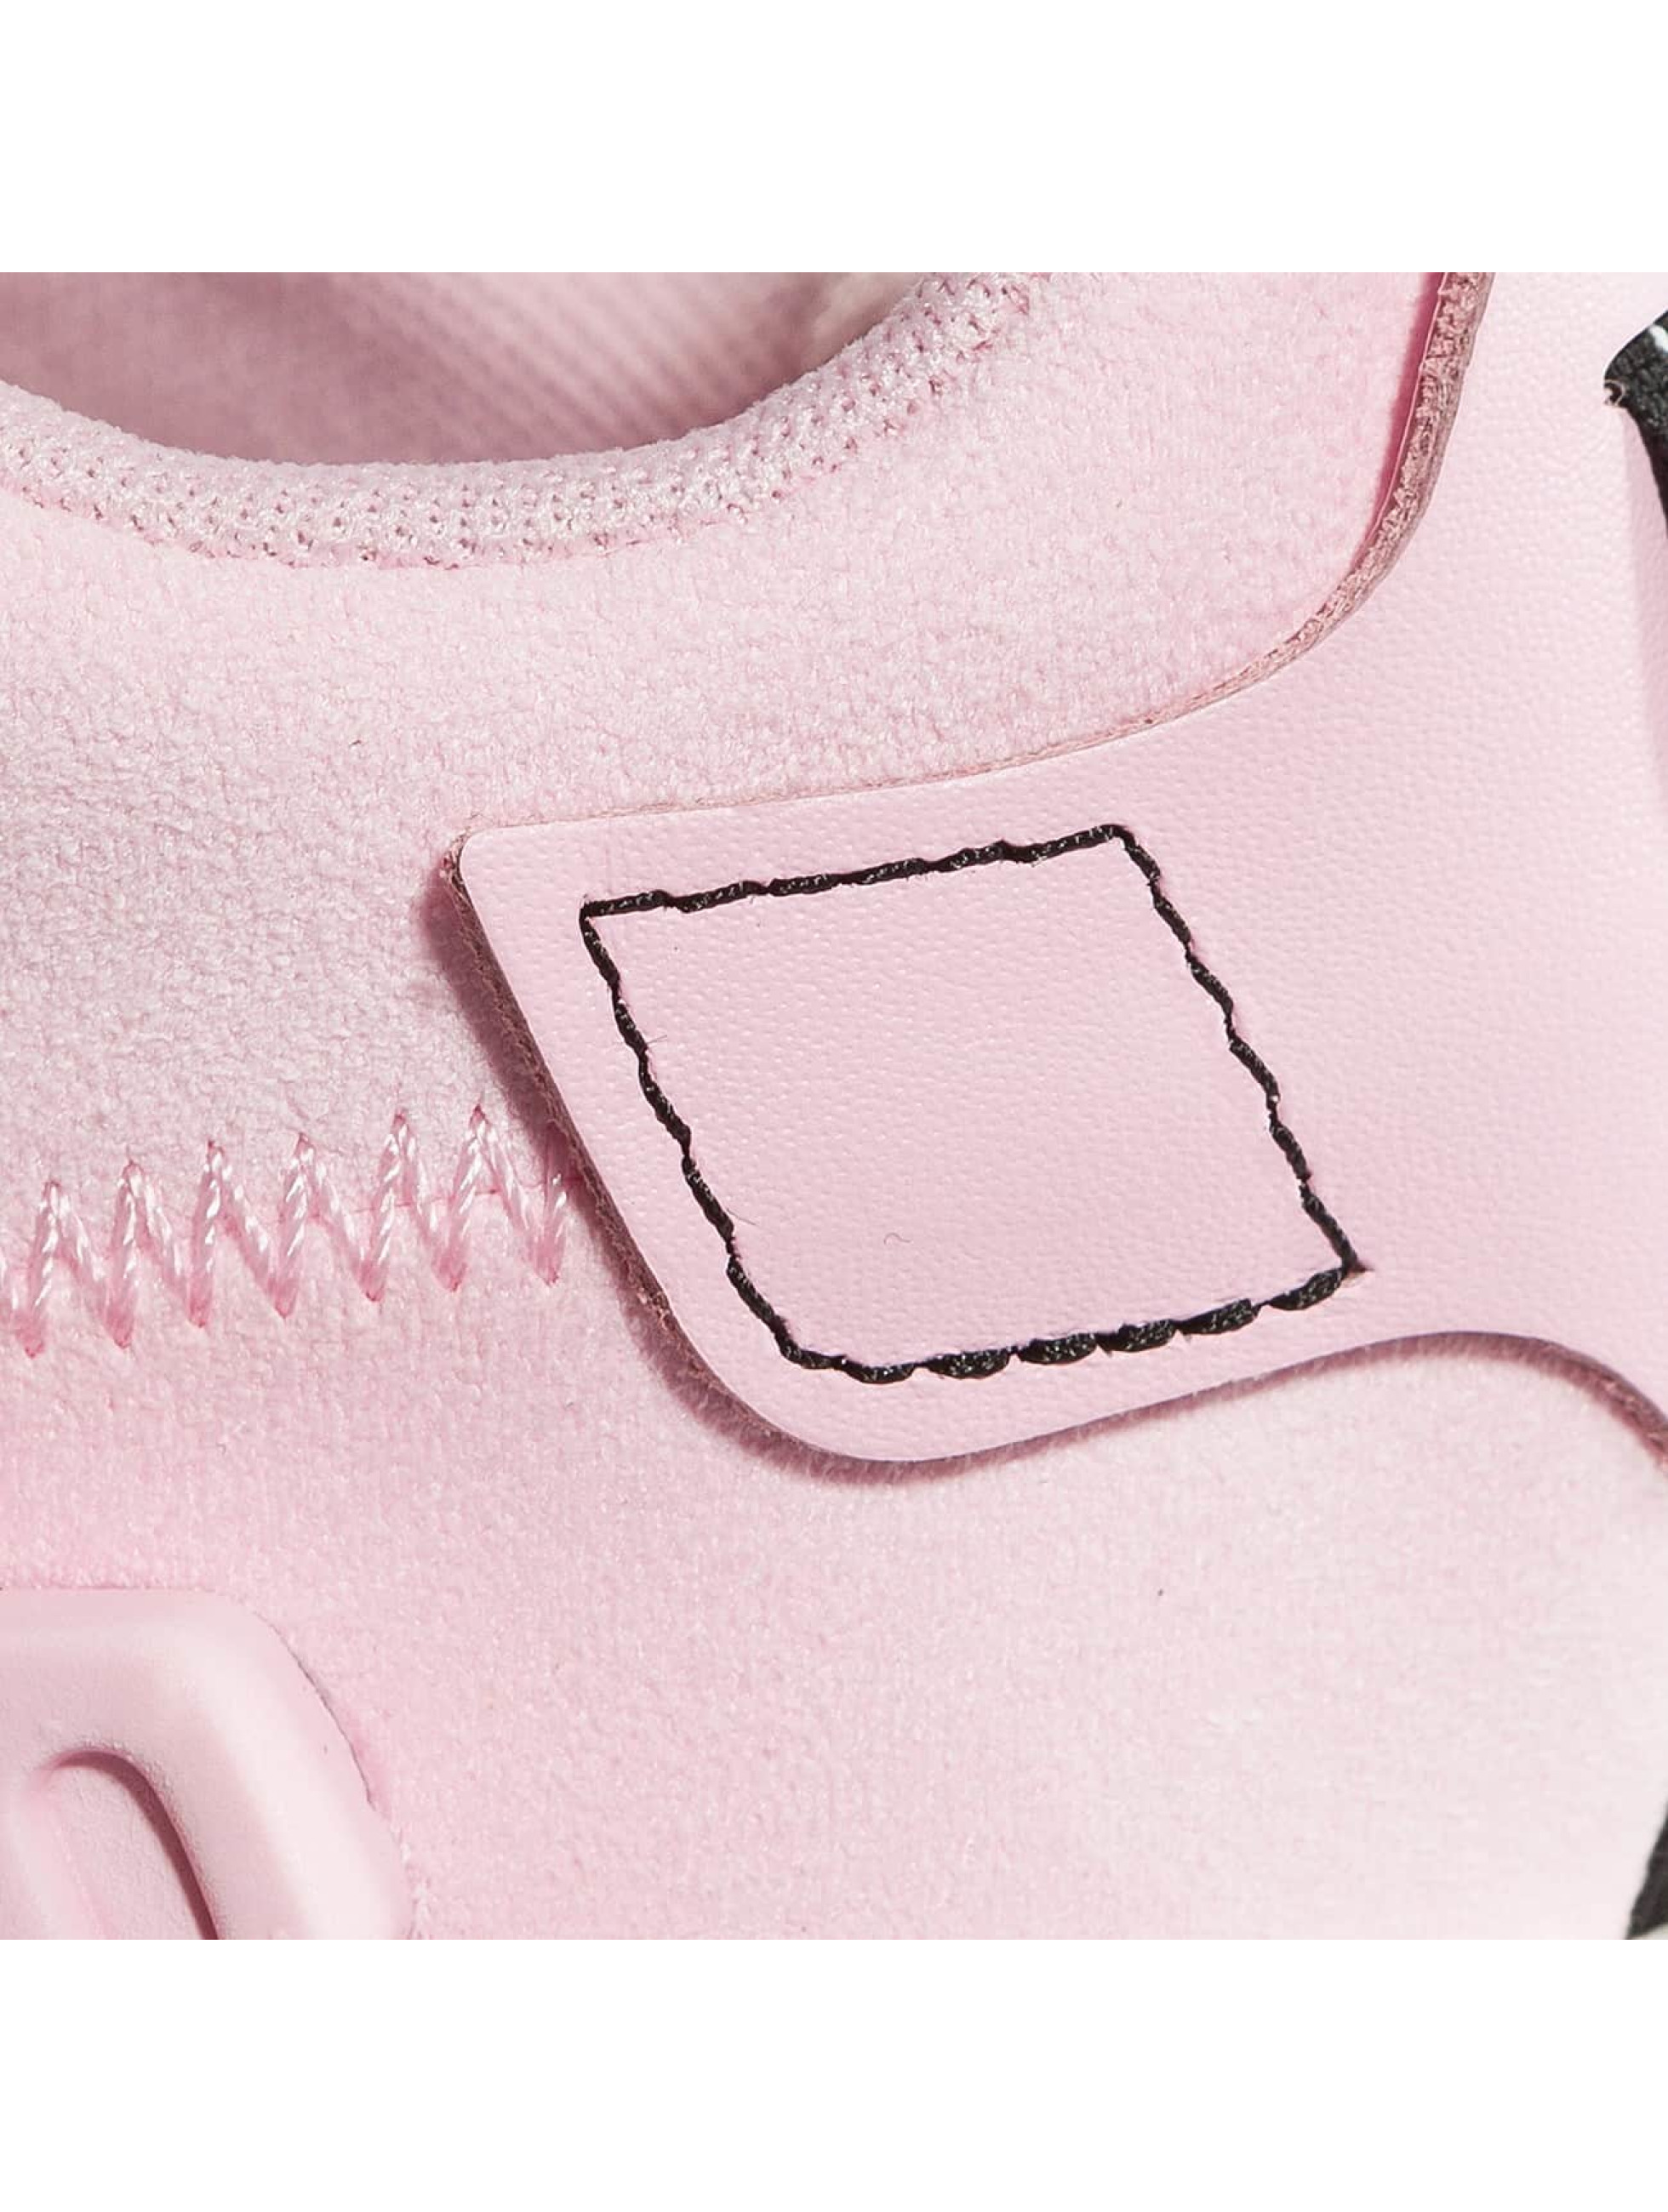 adidas originals Sneakers NMD_R2 W rose